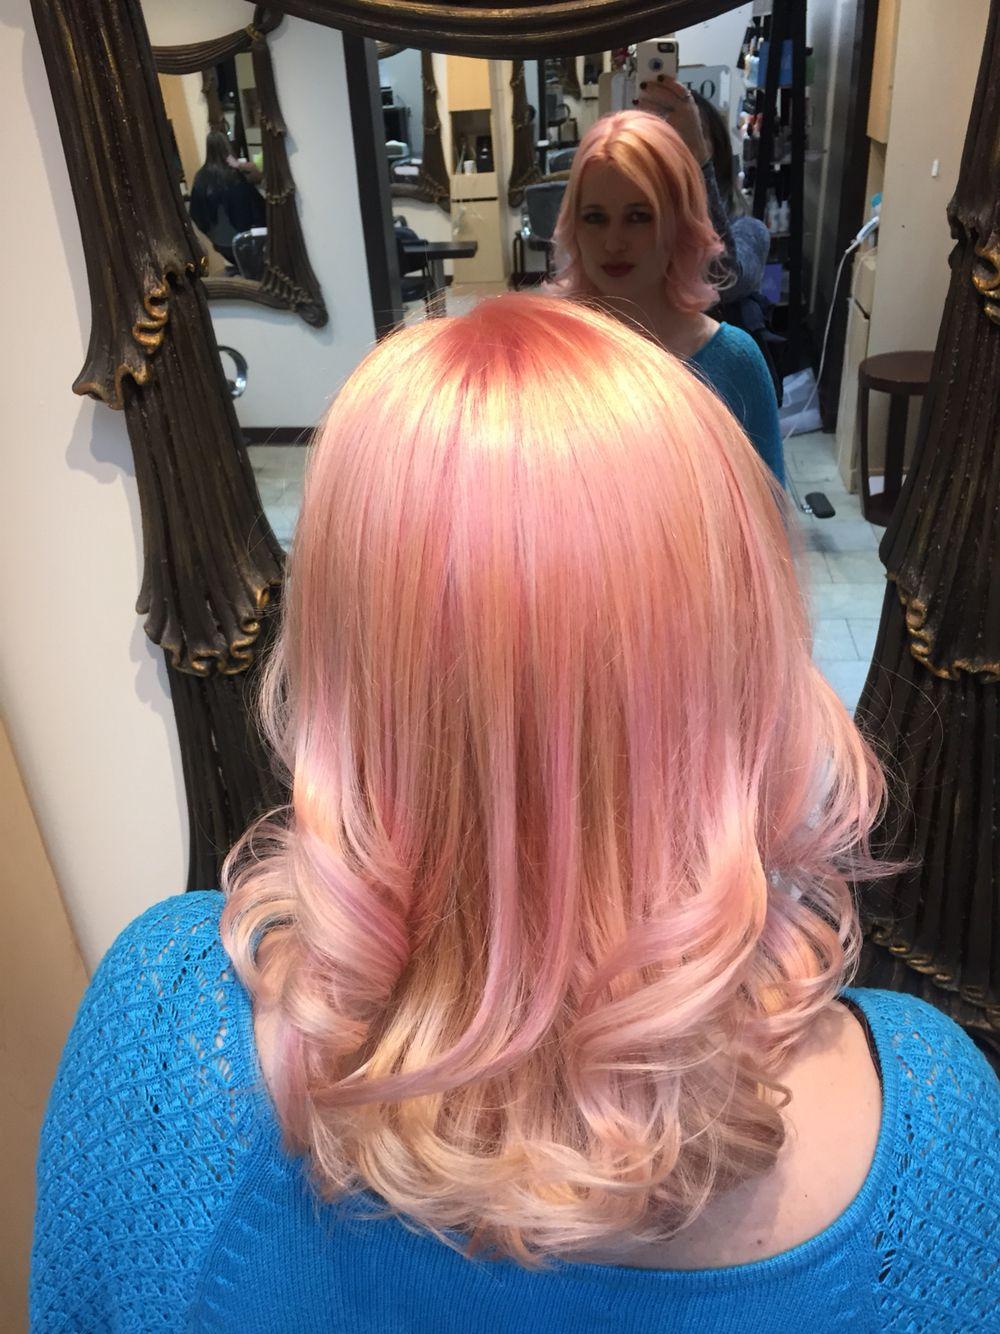 Dusty rose hair color #pinkhair @amandaleighortiz